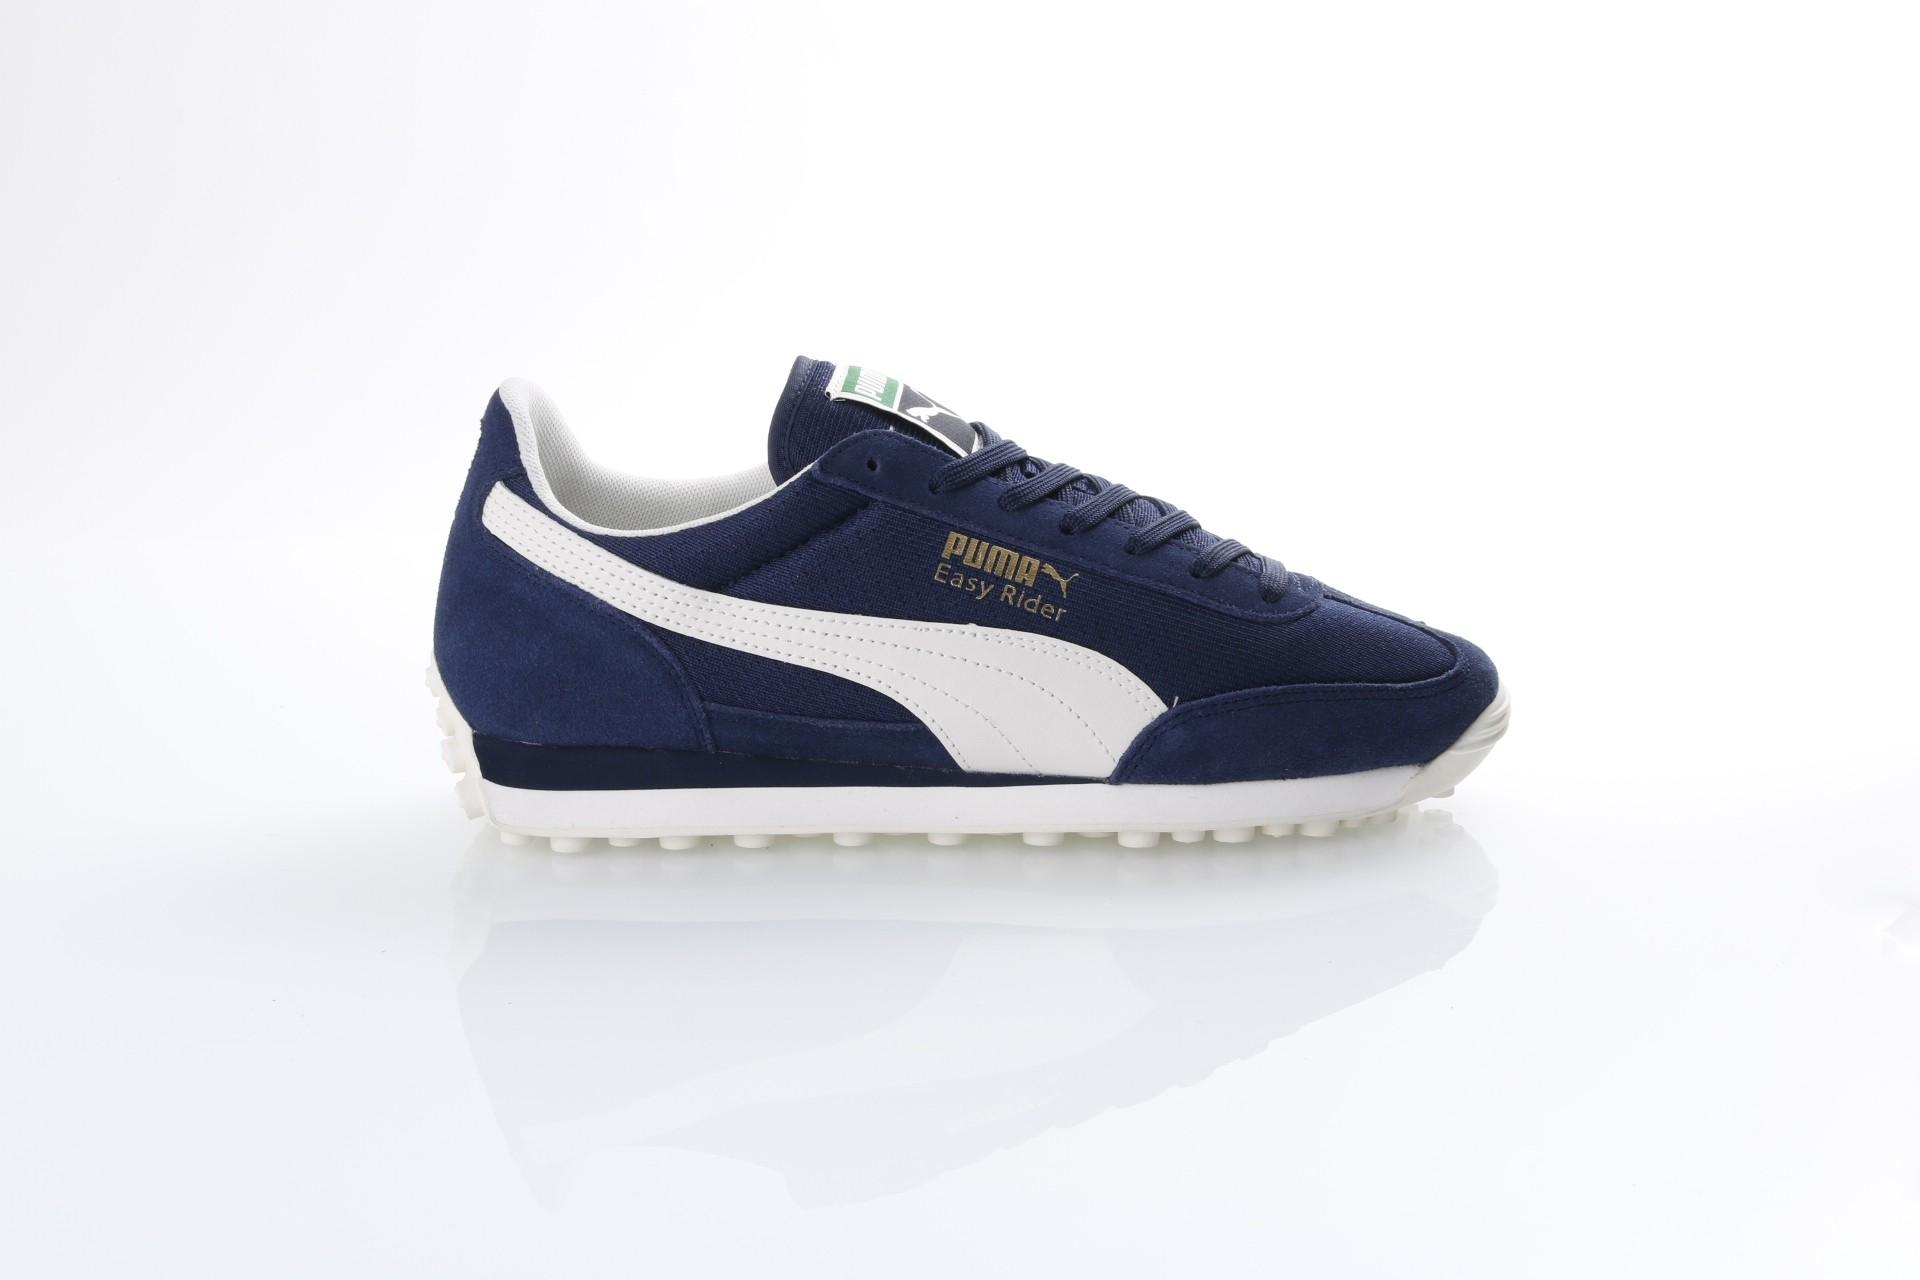 Afbeelding van Puma 365579-01 Sneakers Easy rider classic Blauw